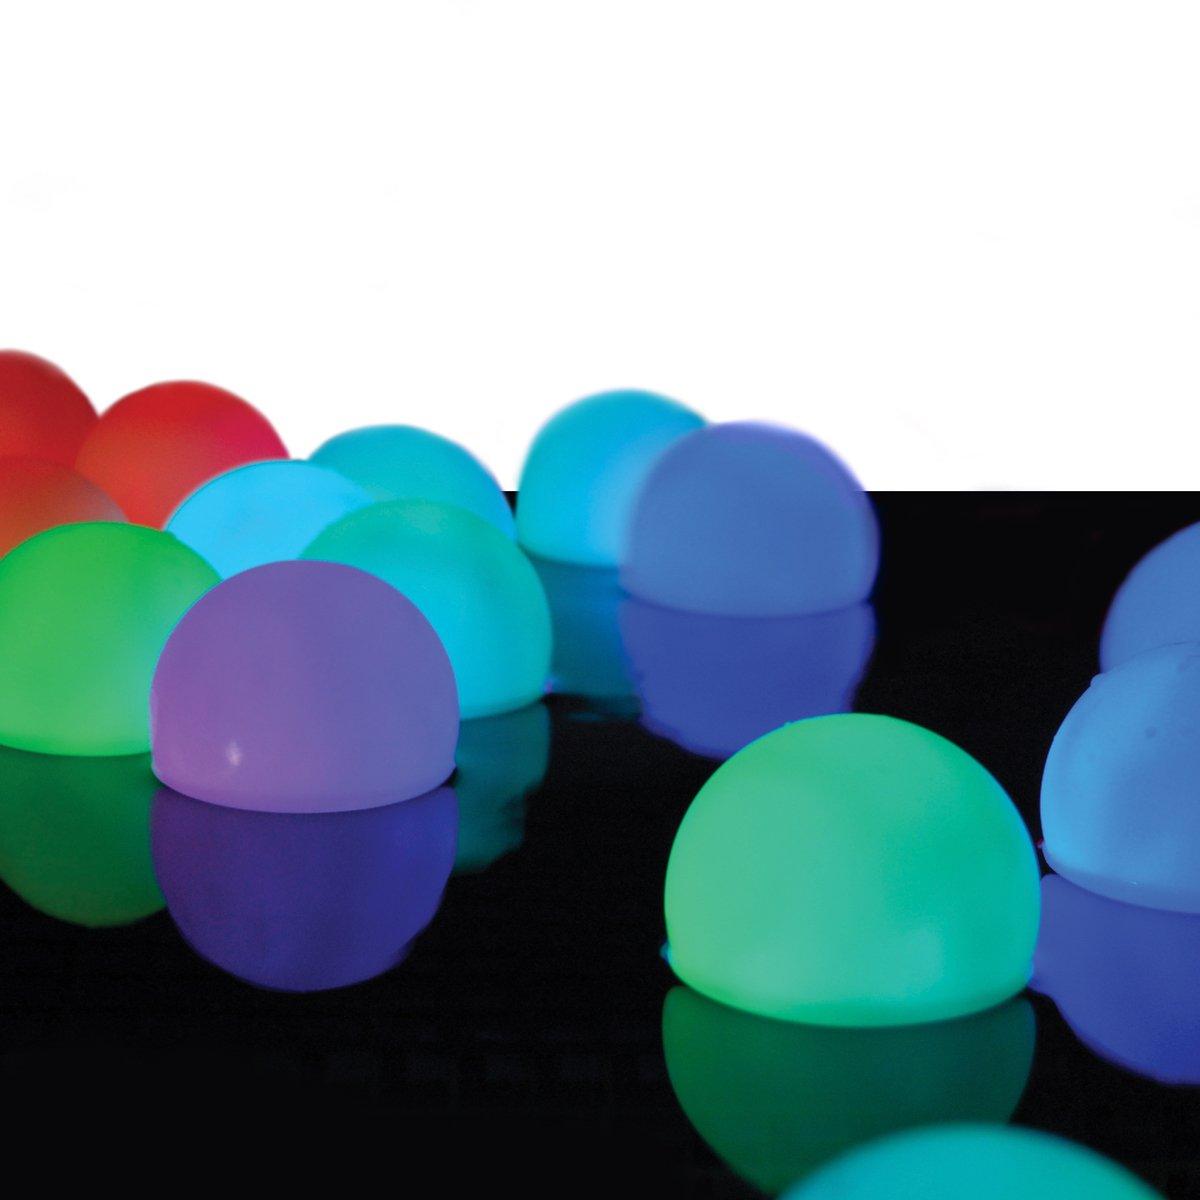 Set of 12 Mood Light Garden Deco Balls- Battery Operated 3'' Floating Color Changing LED Balls for Pools, Ponds & More